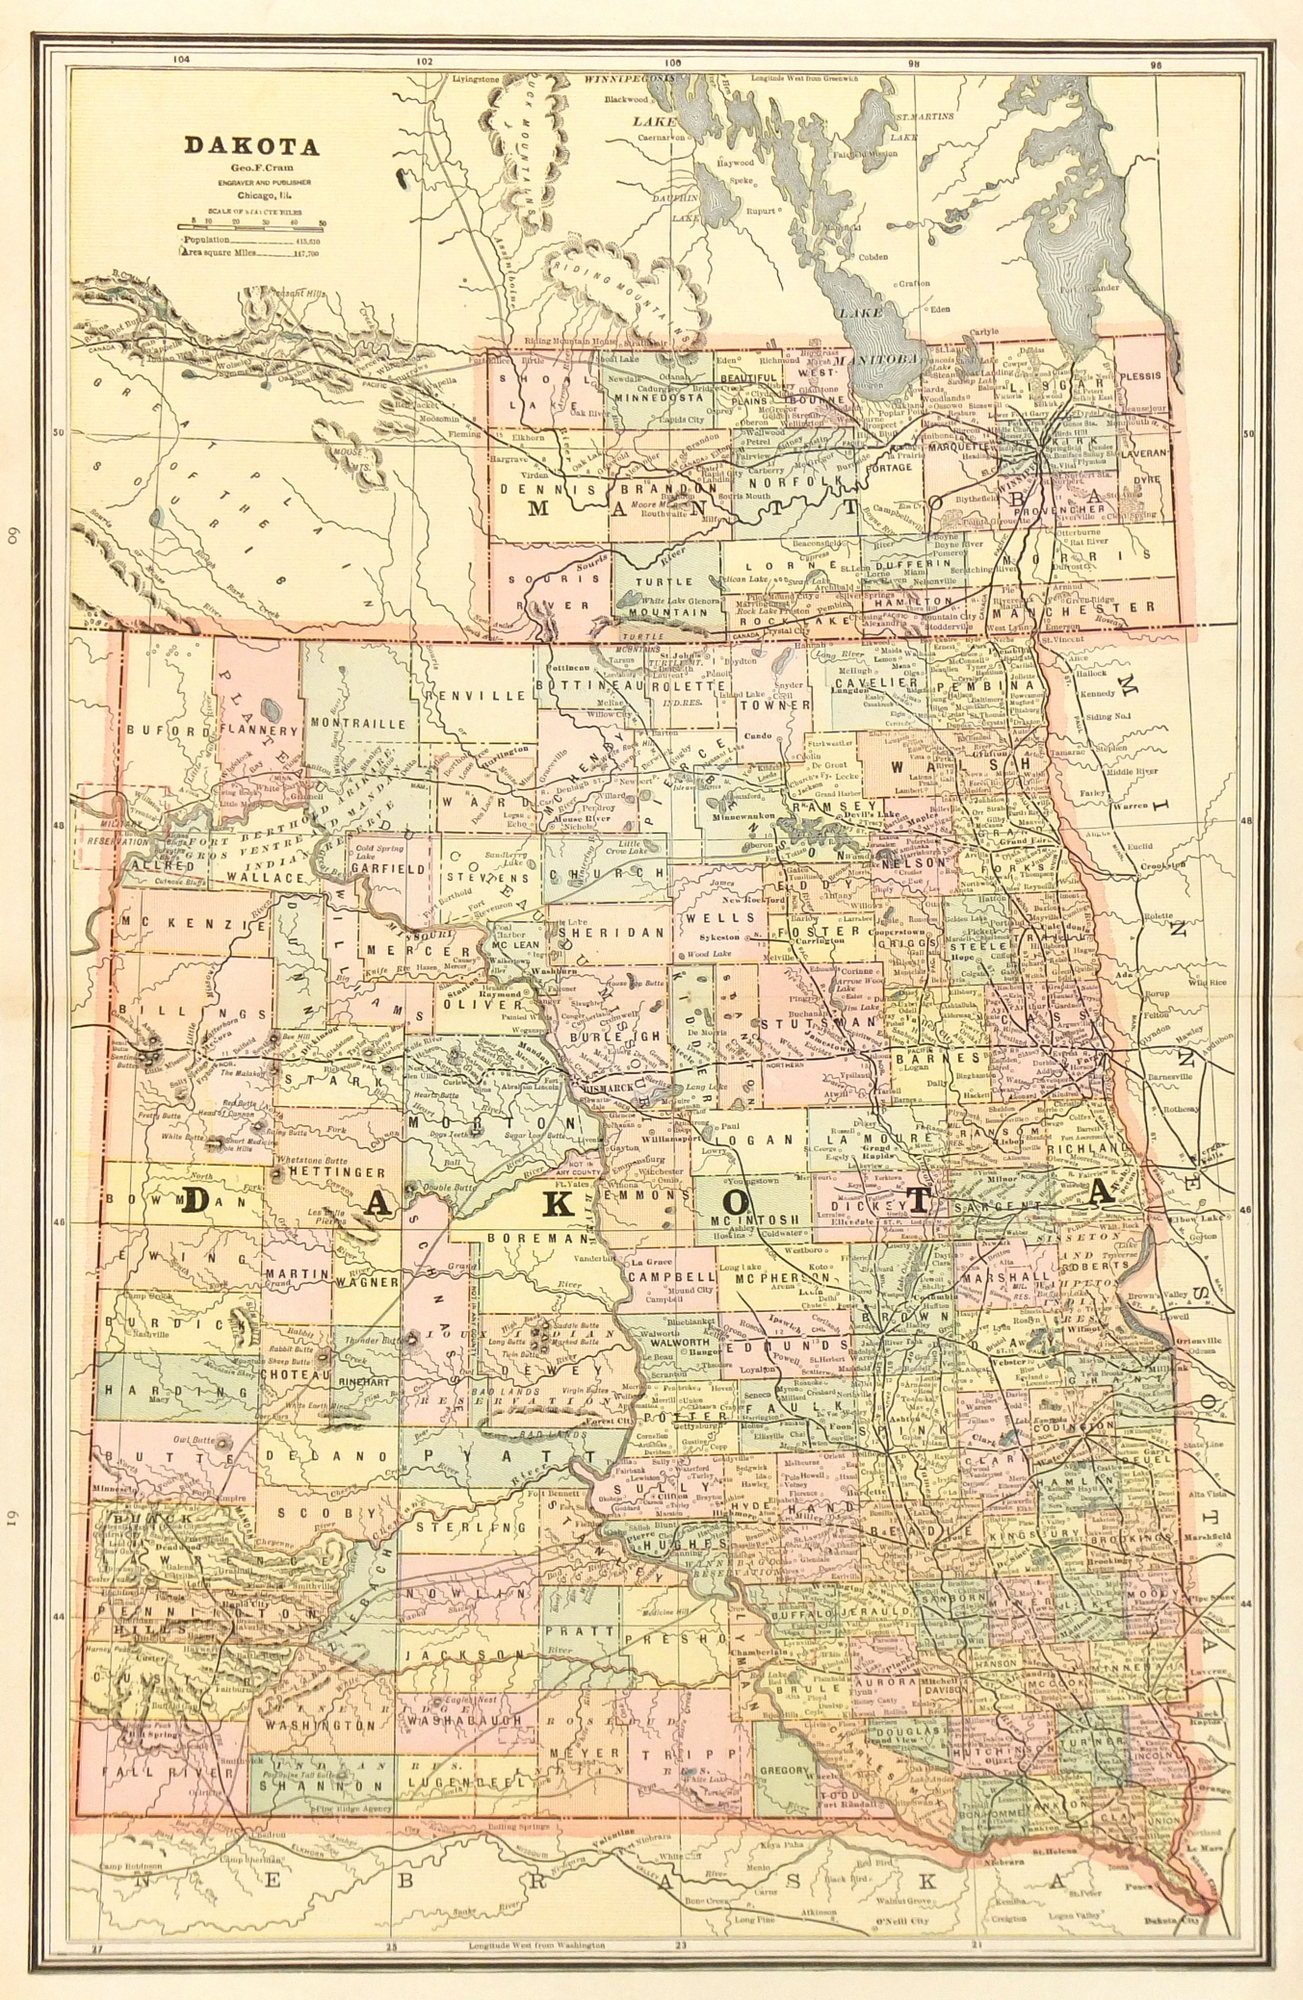 Dakota Territory Map, 1885-main-7625K